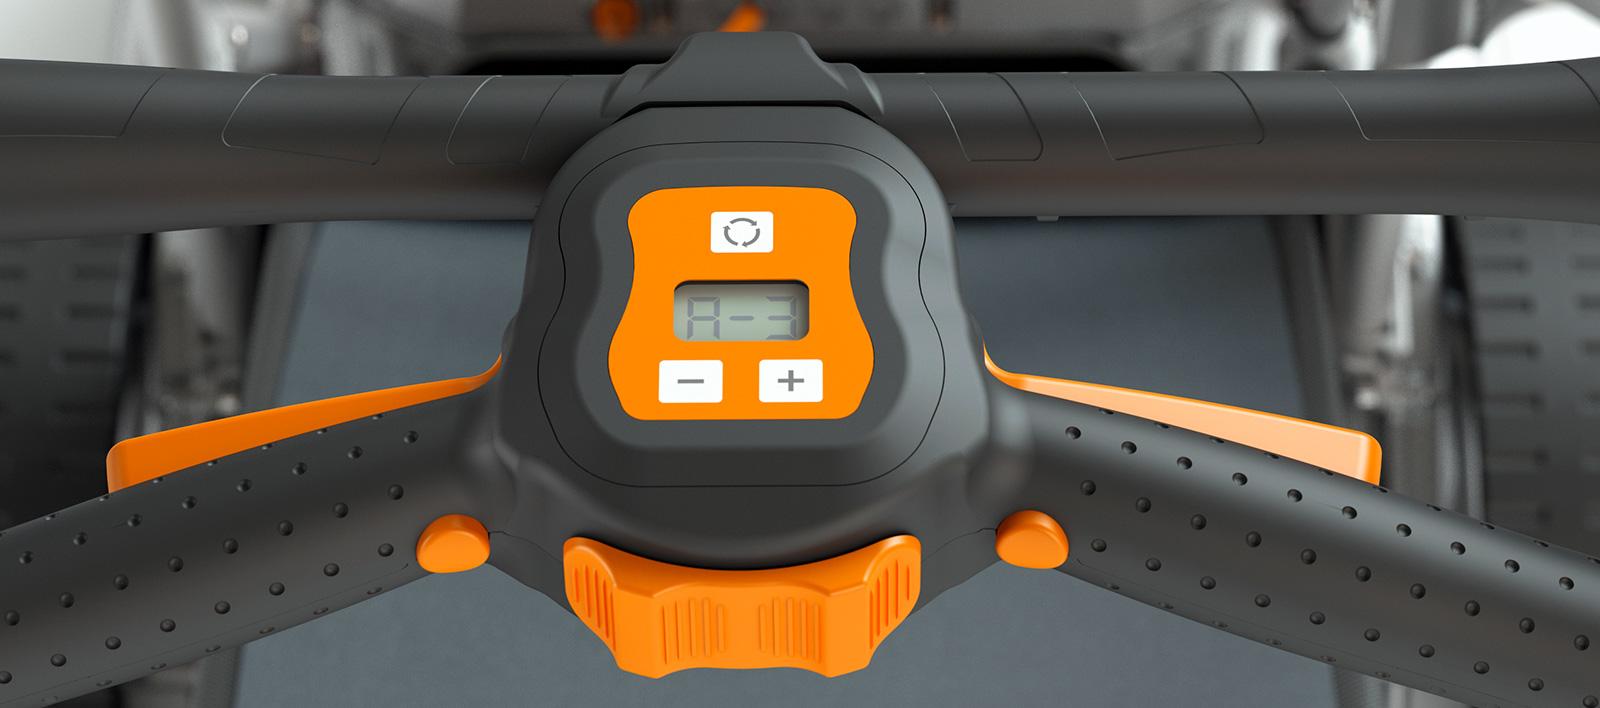 Pellenc-Tondeuse-Rasion-Smart-Ecran-LCD